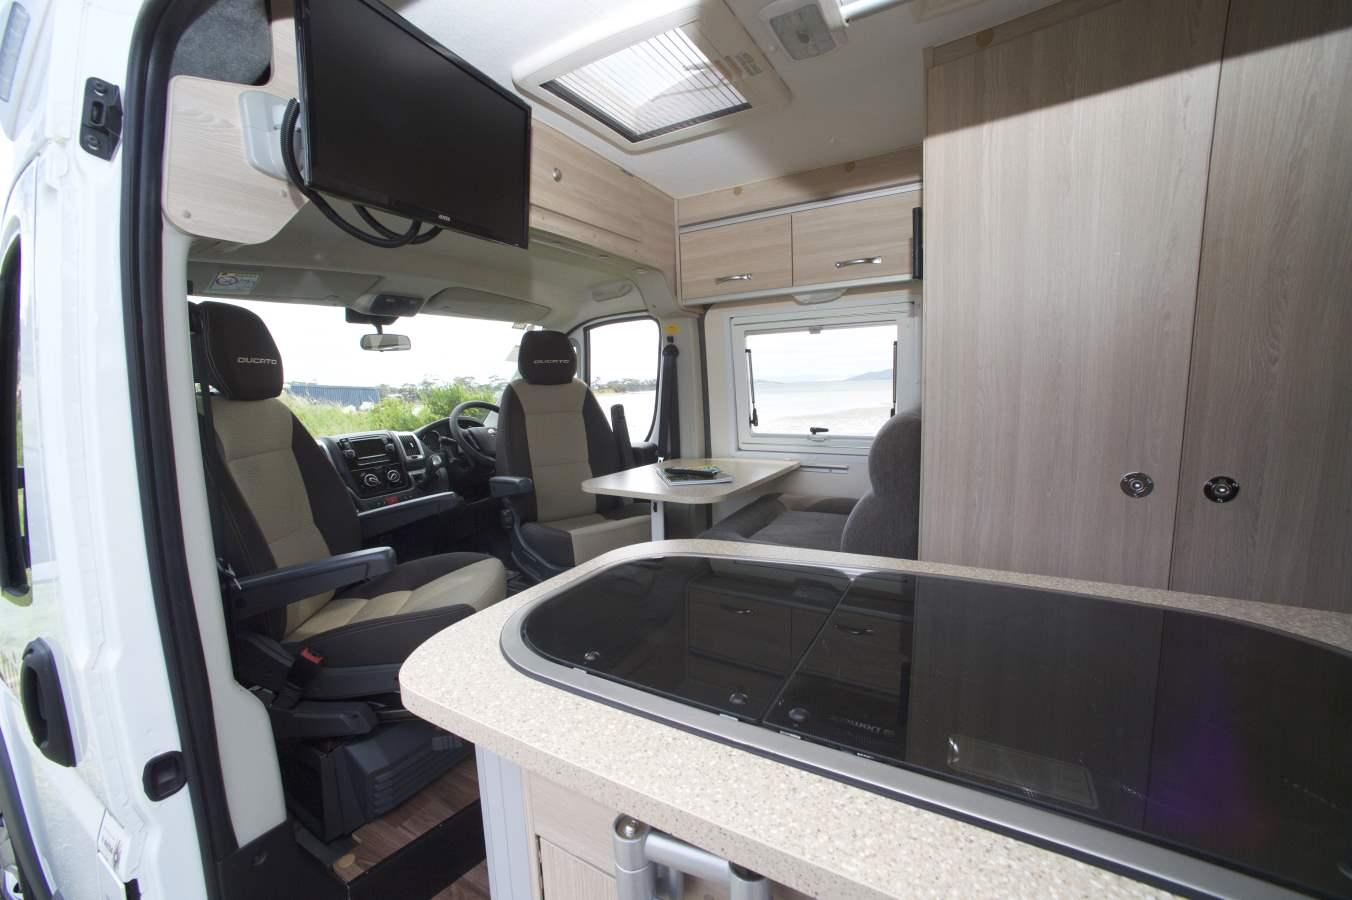 Cruisin Sandpiper Interior - Motorhome Rental Canberra - Campervan Rental Shop